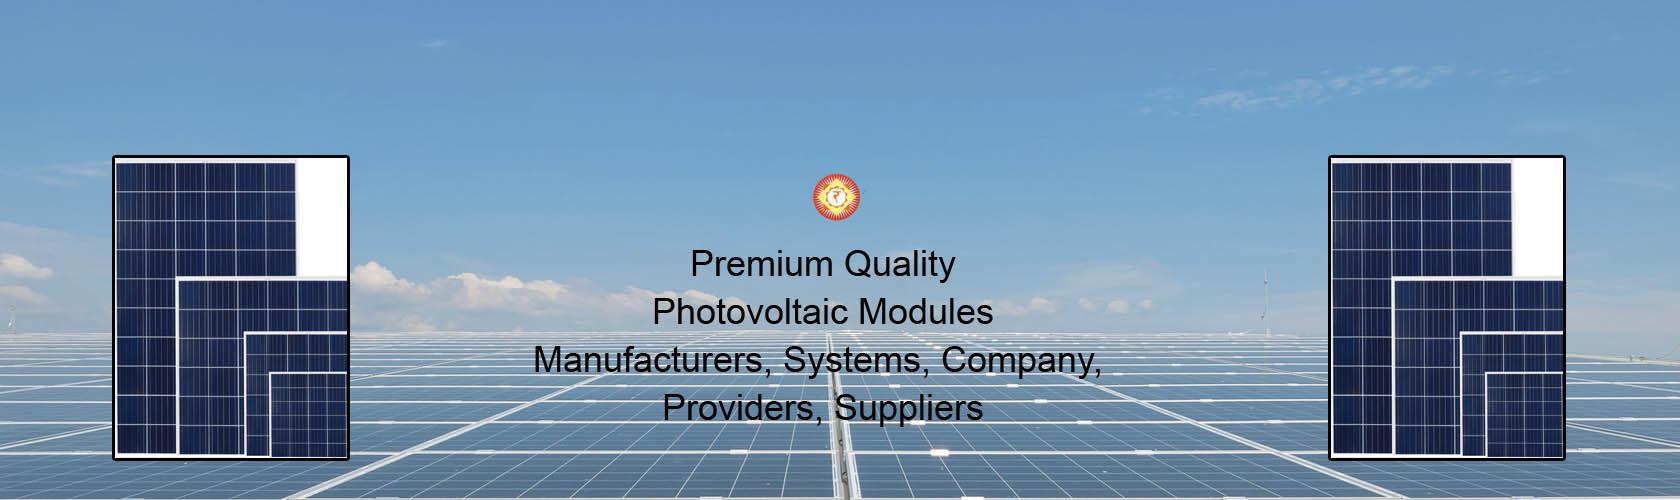 Photovoltaic Modules